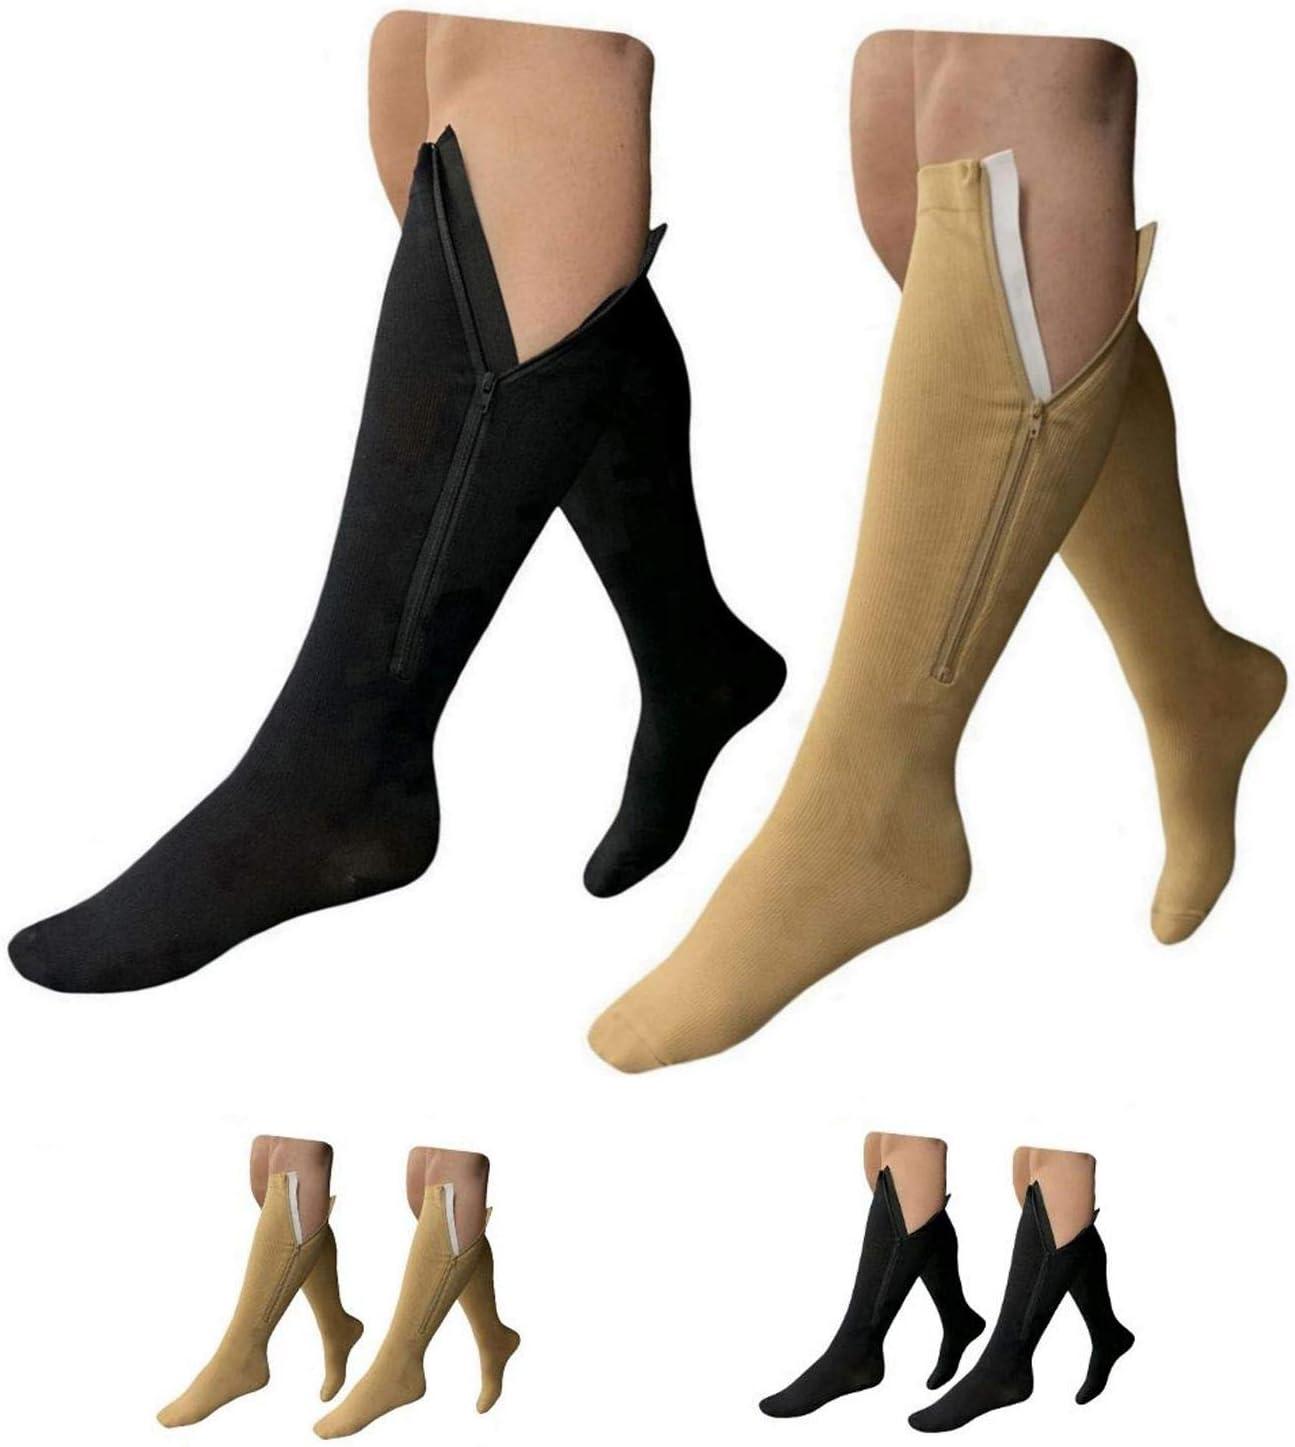 HealthyNees 15-20 mmHg Zipper Compression Wide Big Calf Socks 2 Pack Closed Toe (2 Pairs Mix, 2XL)